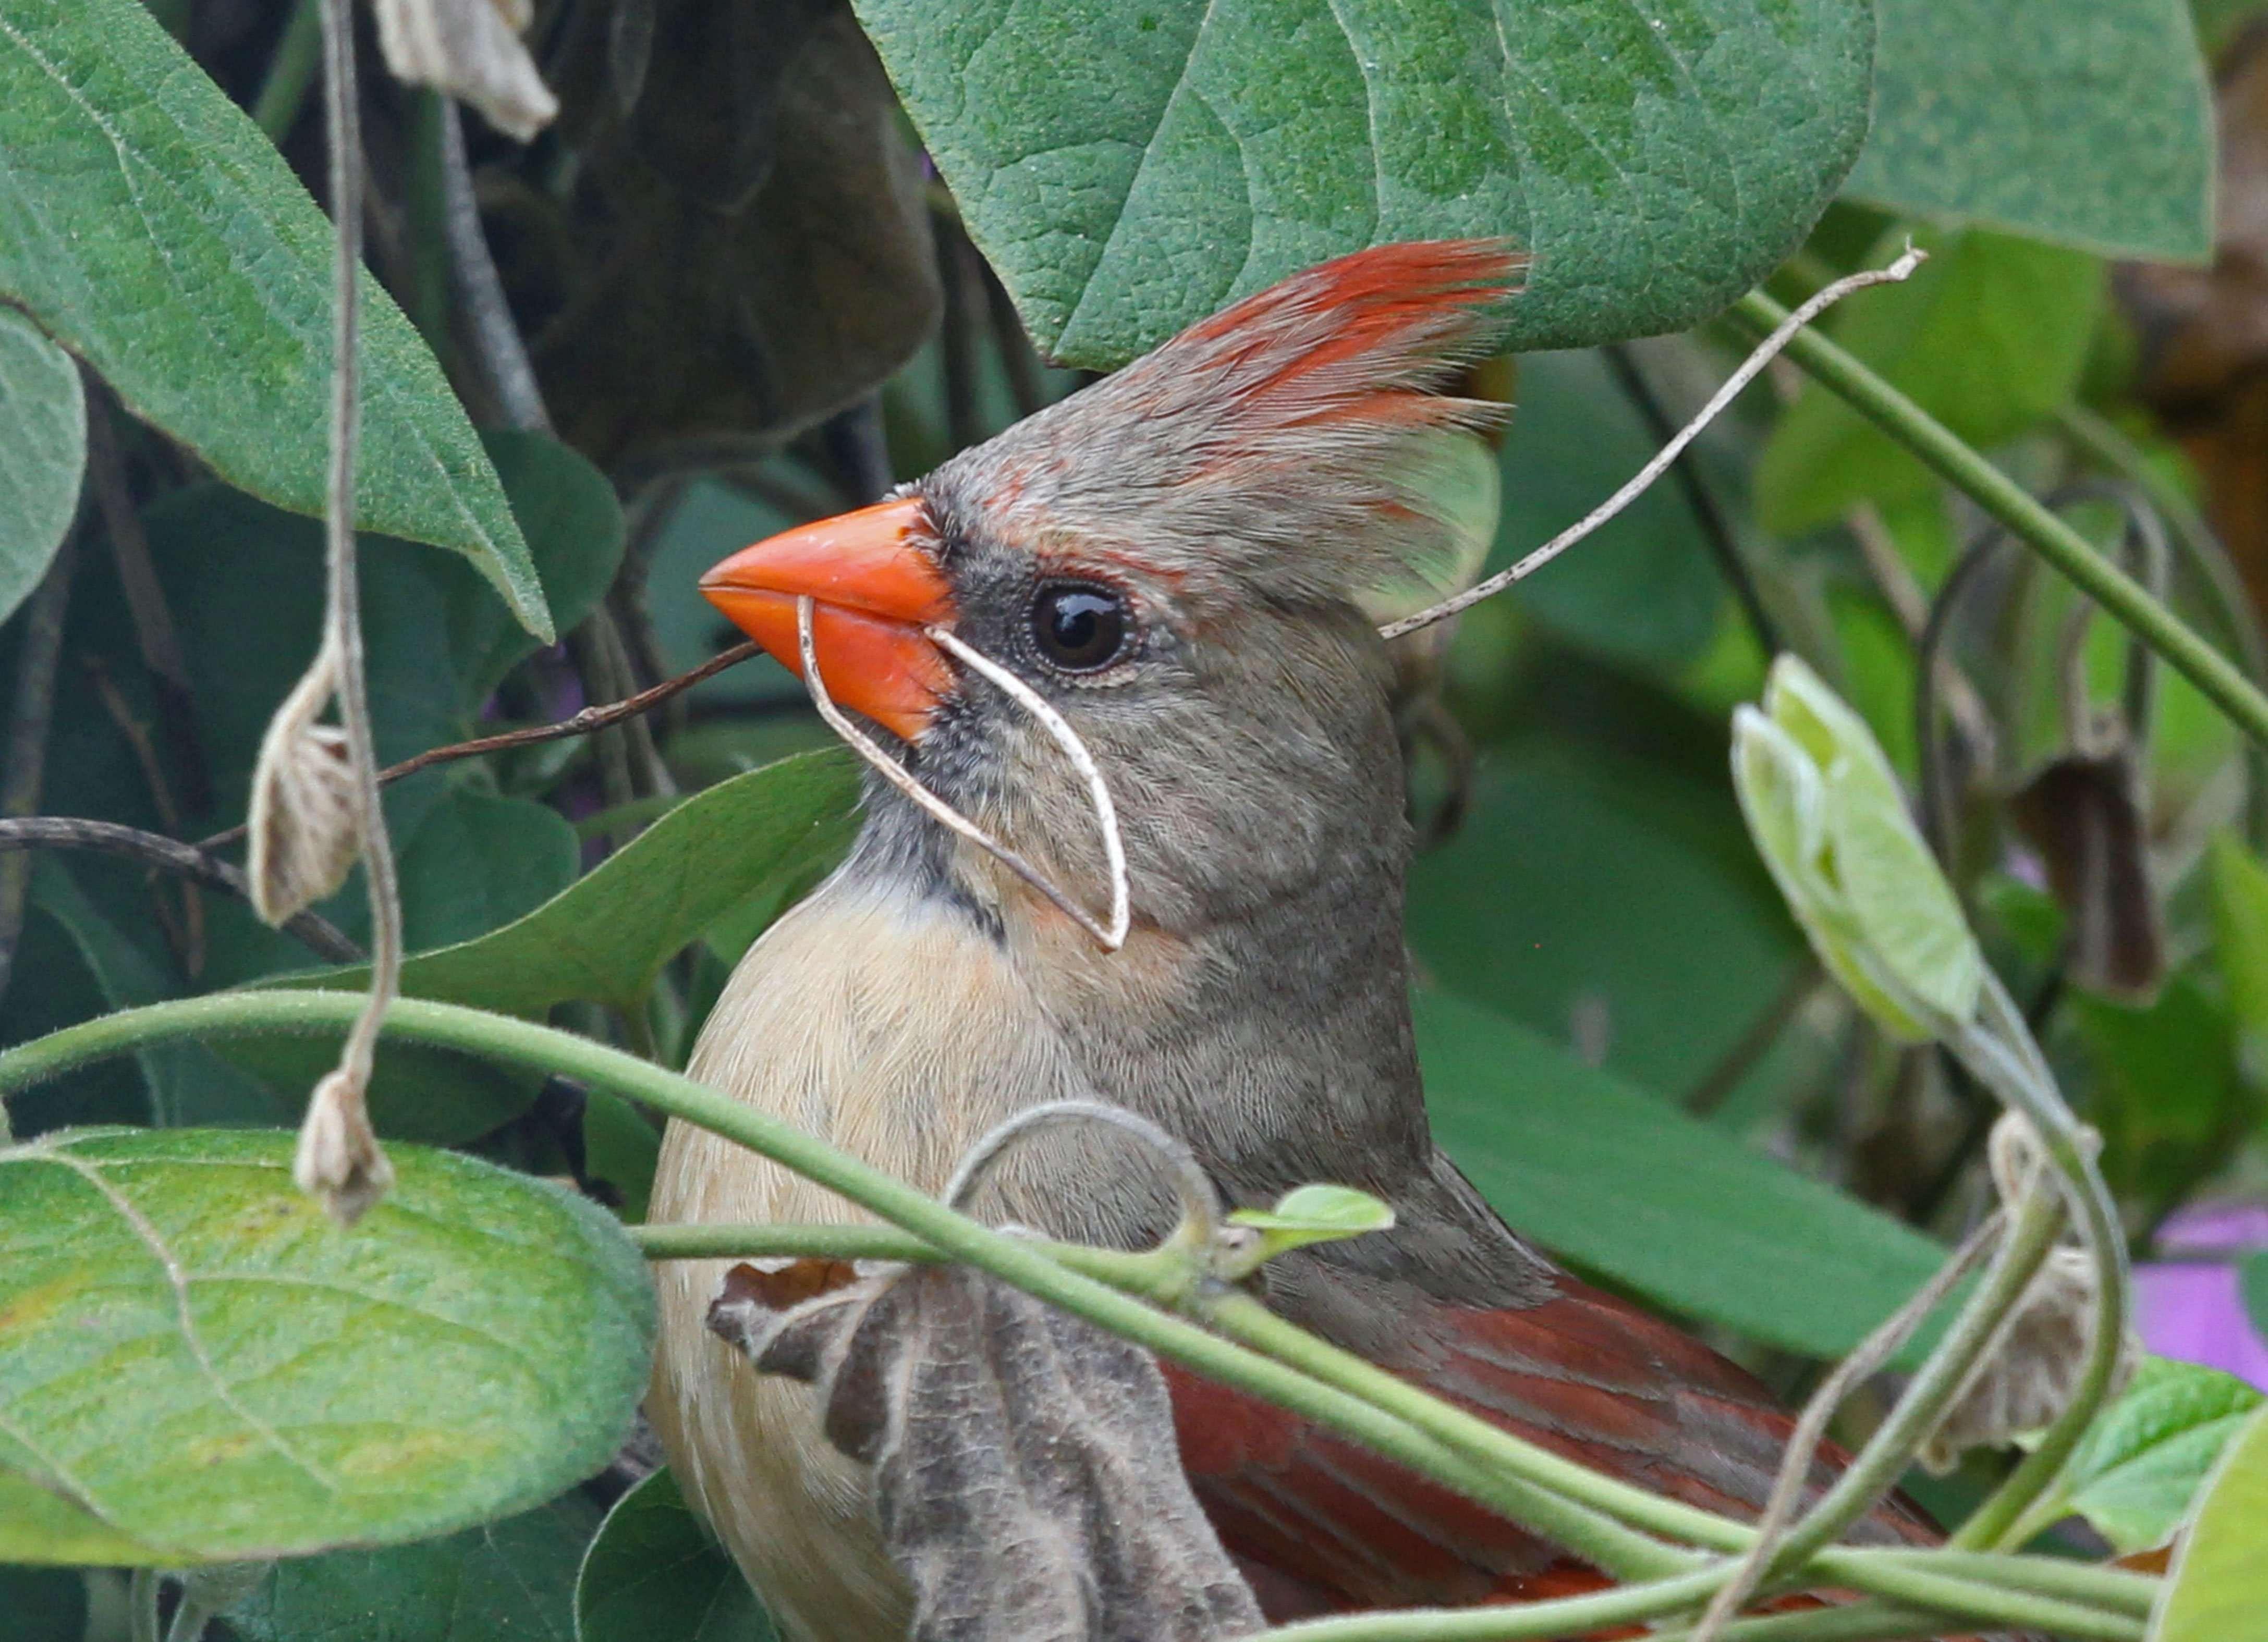 Female Cardinal Nesting